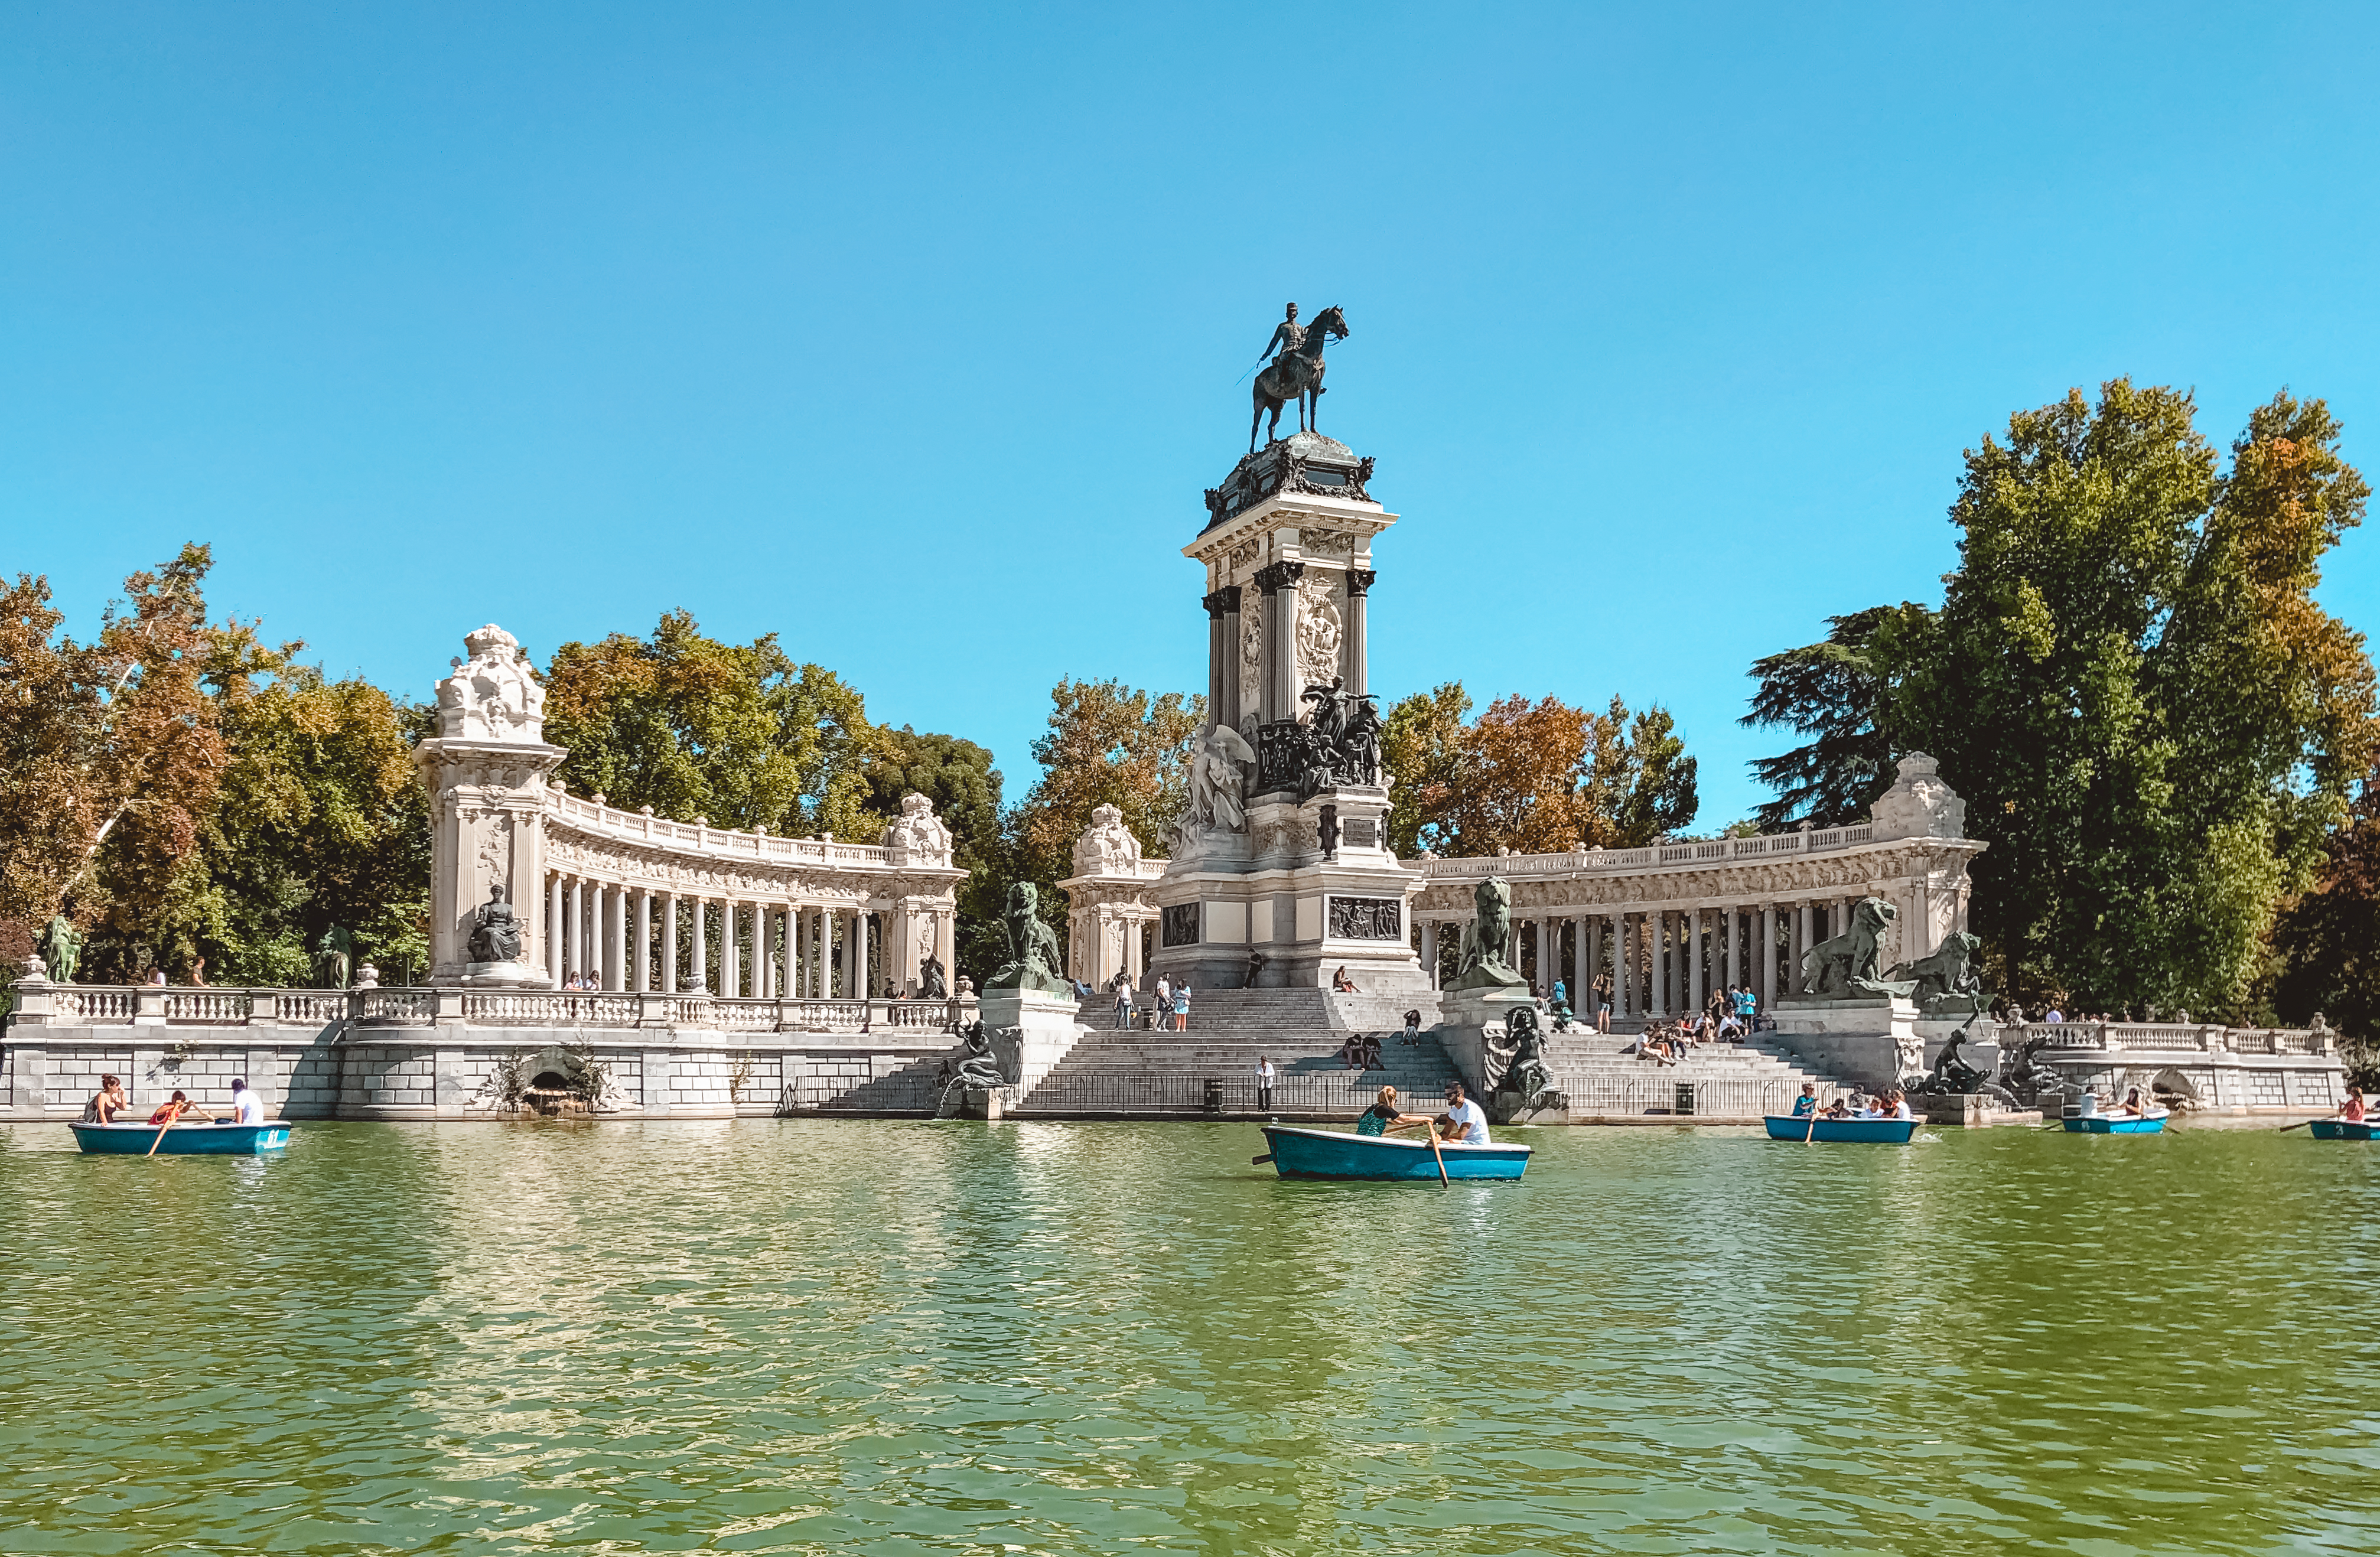 muslim-travel-guide-Madrid-Spain-what-to-do-El-Retiro-Park